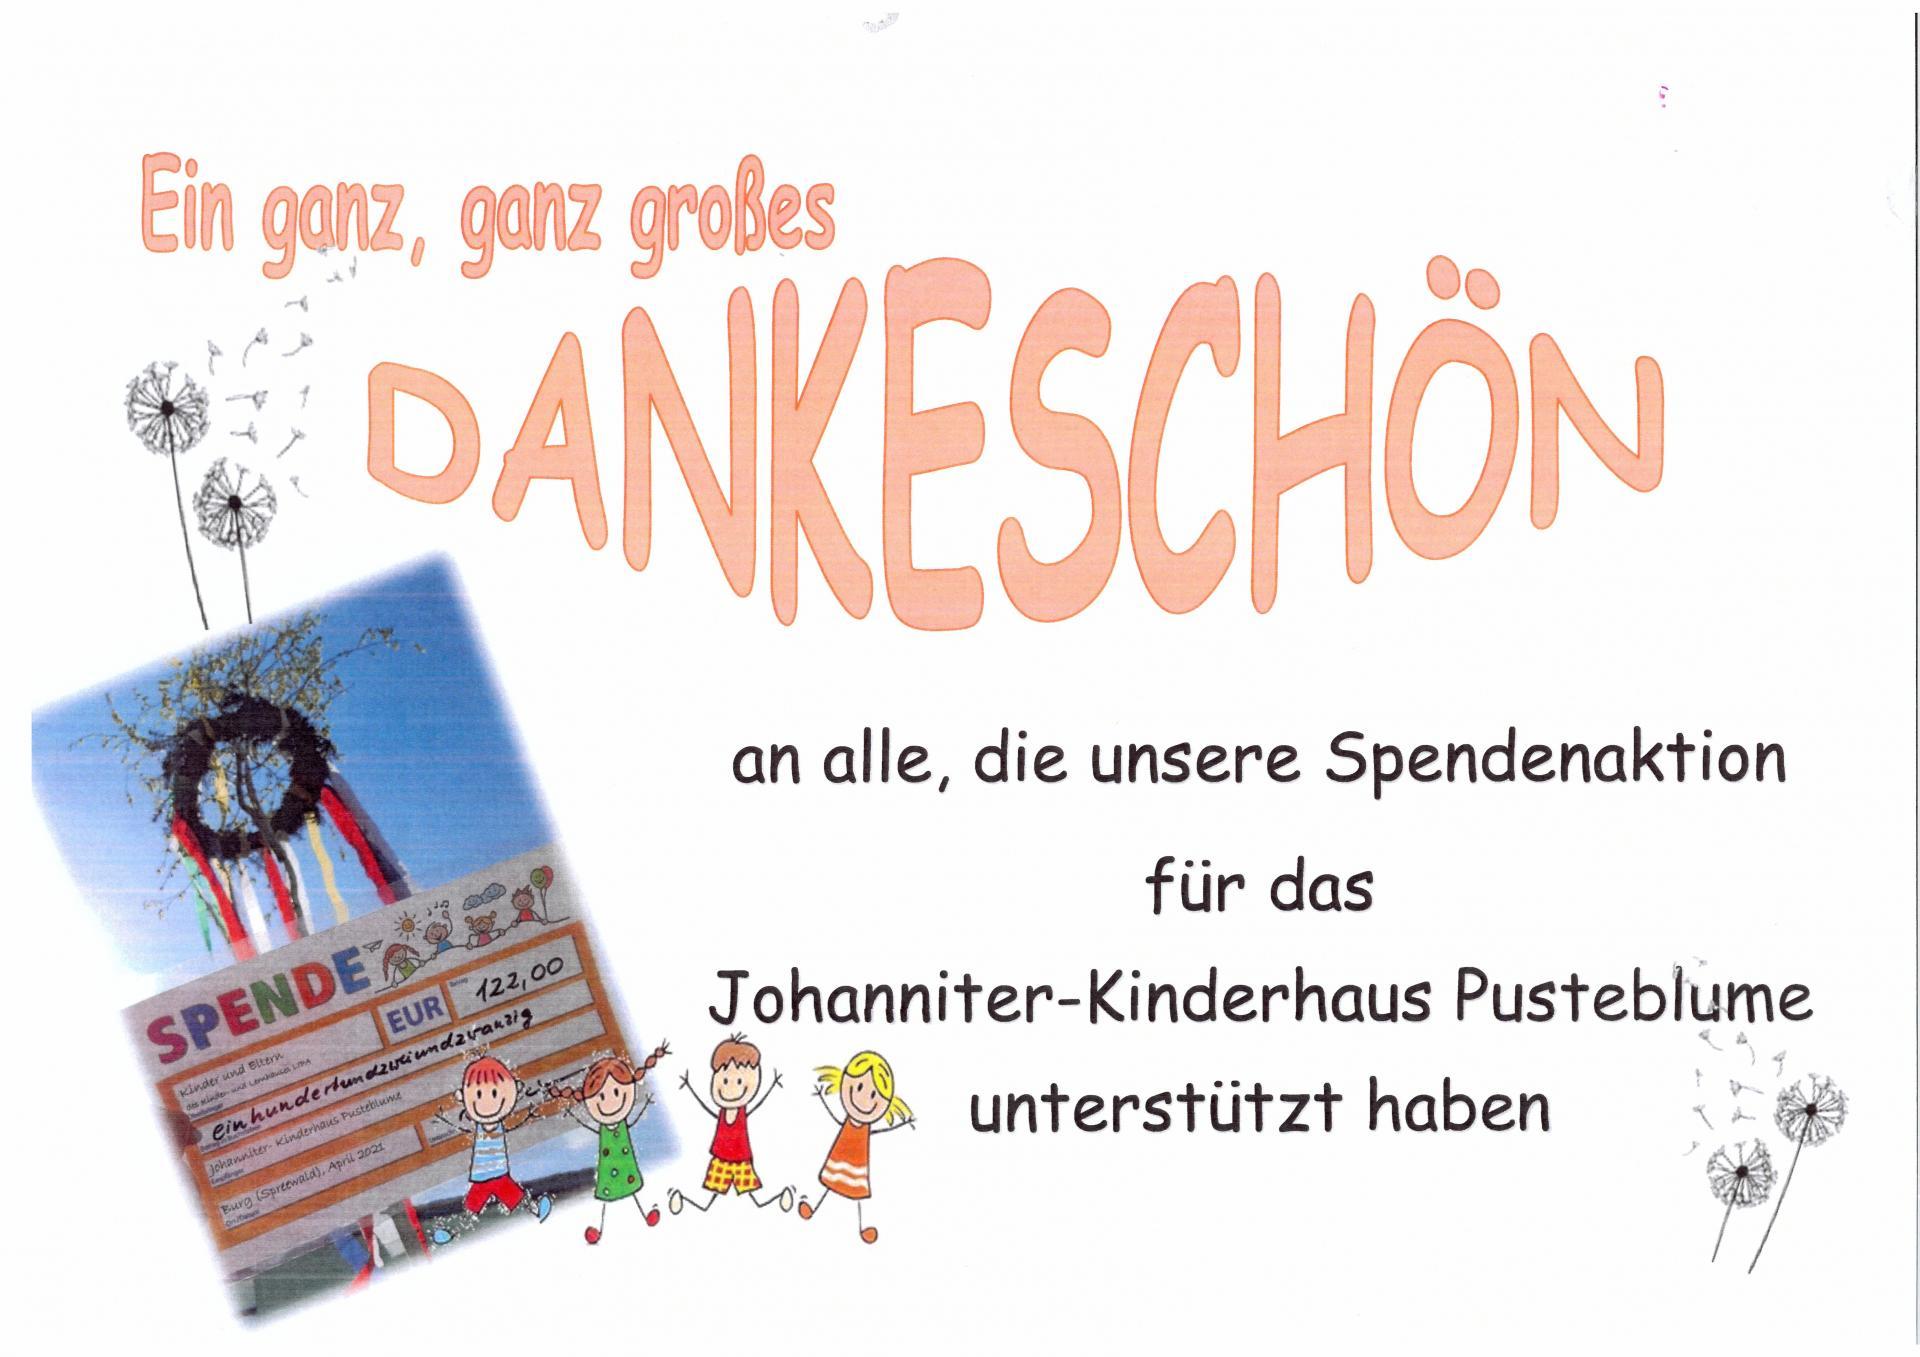 spende dankeschön_0001 (2)